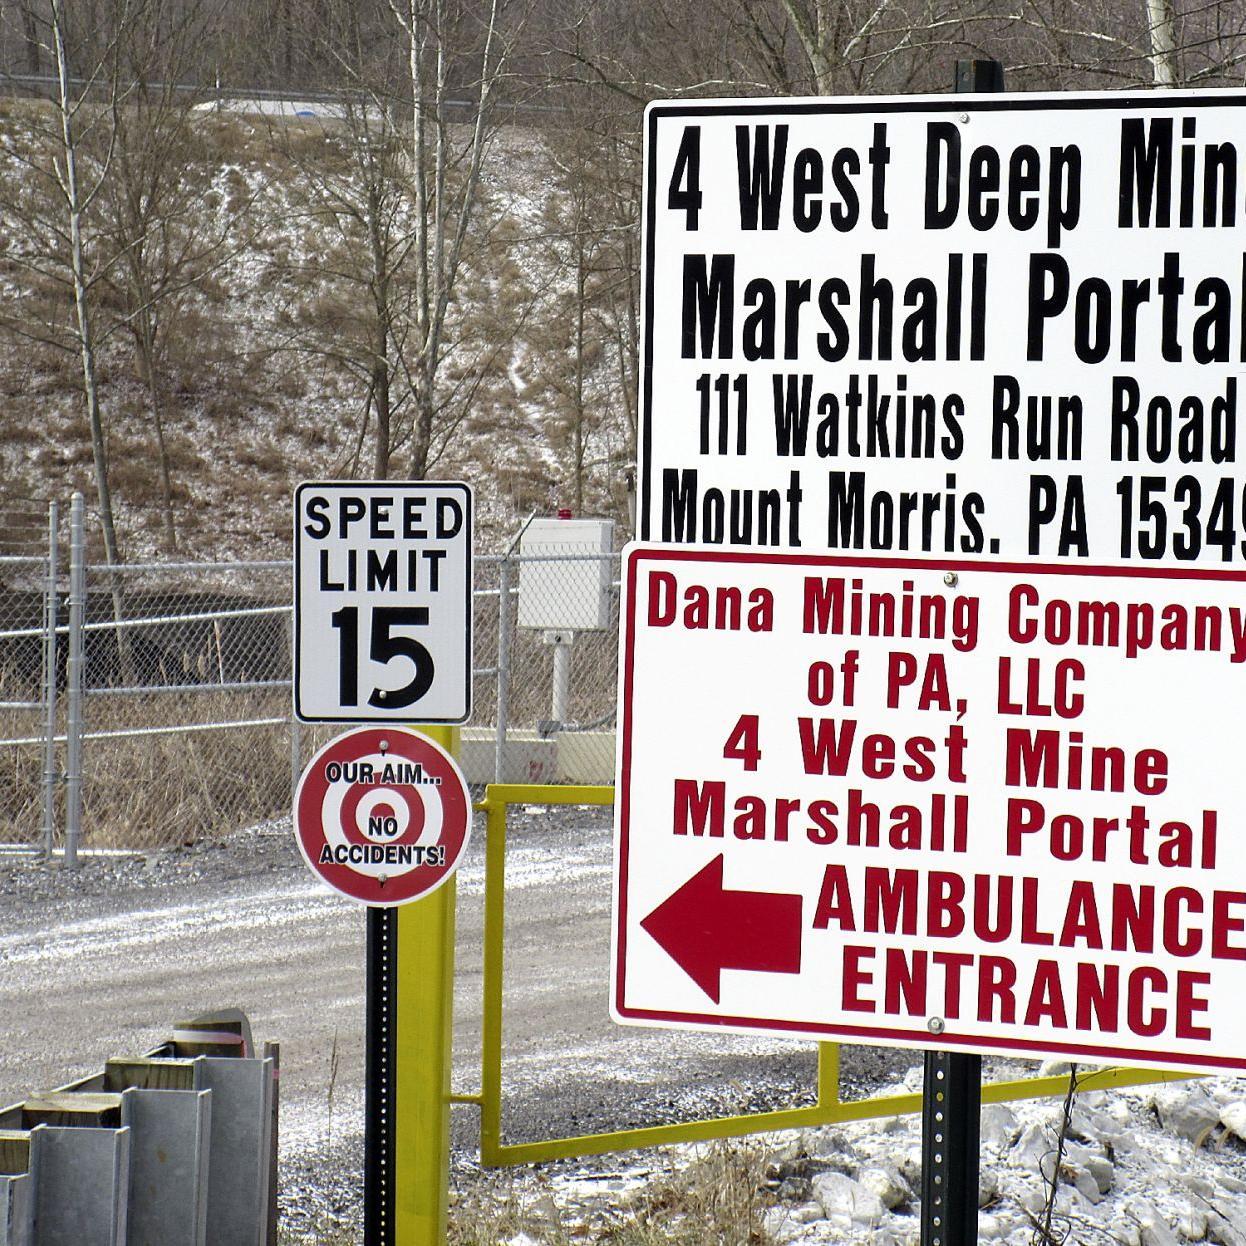 Dana Mining to close 4 West Mine near Mt  Morris | Local